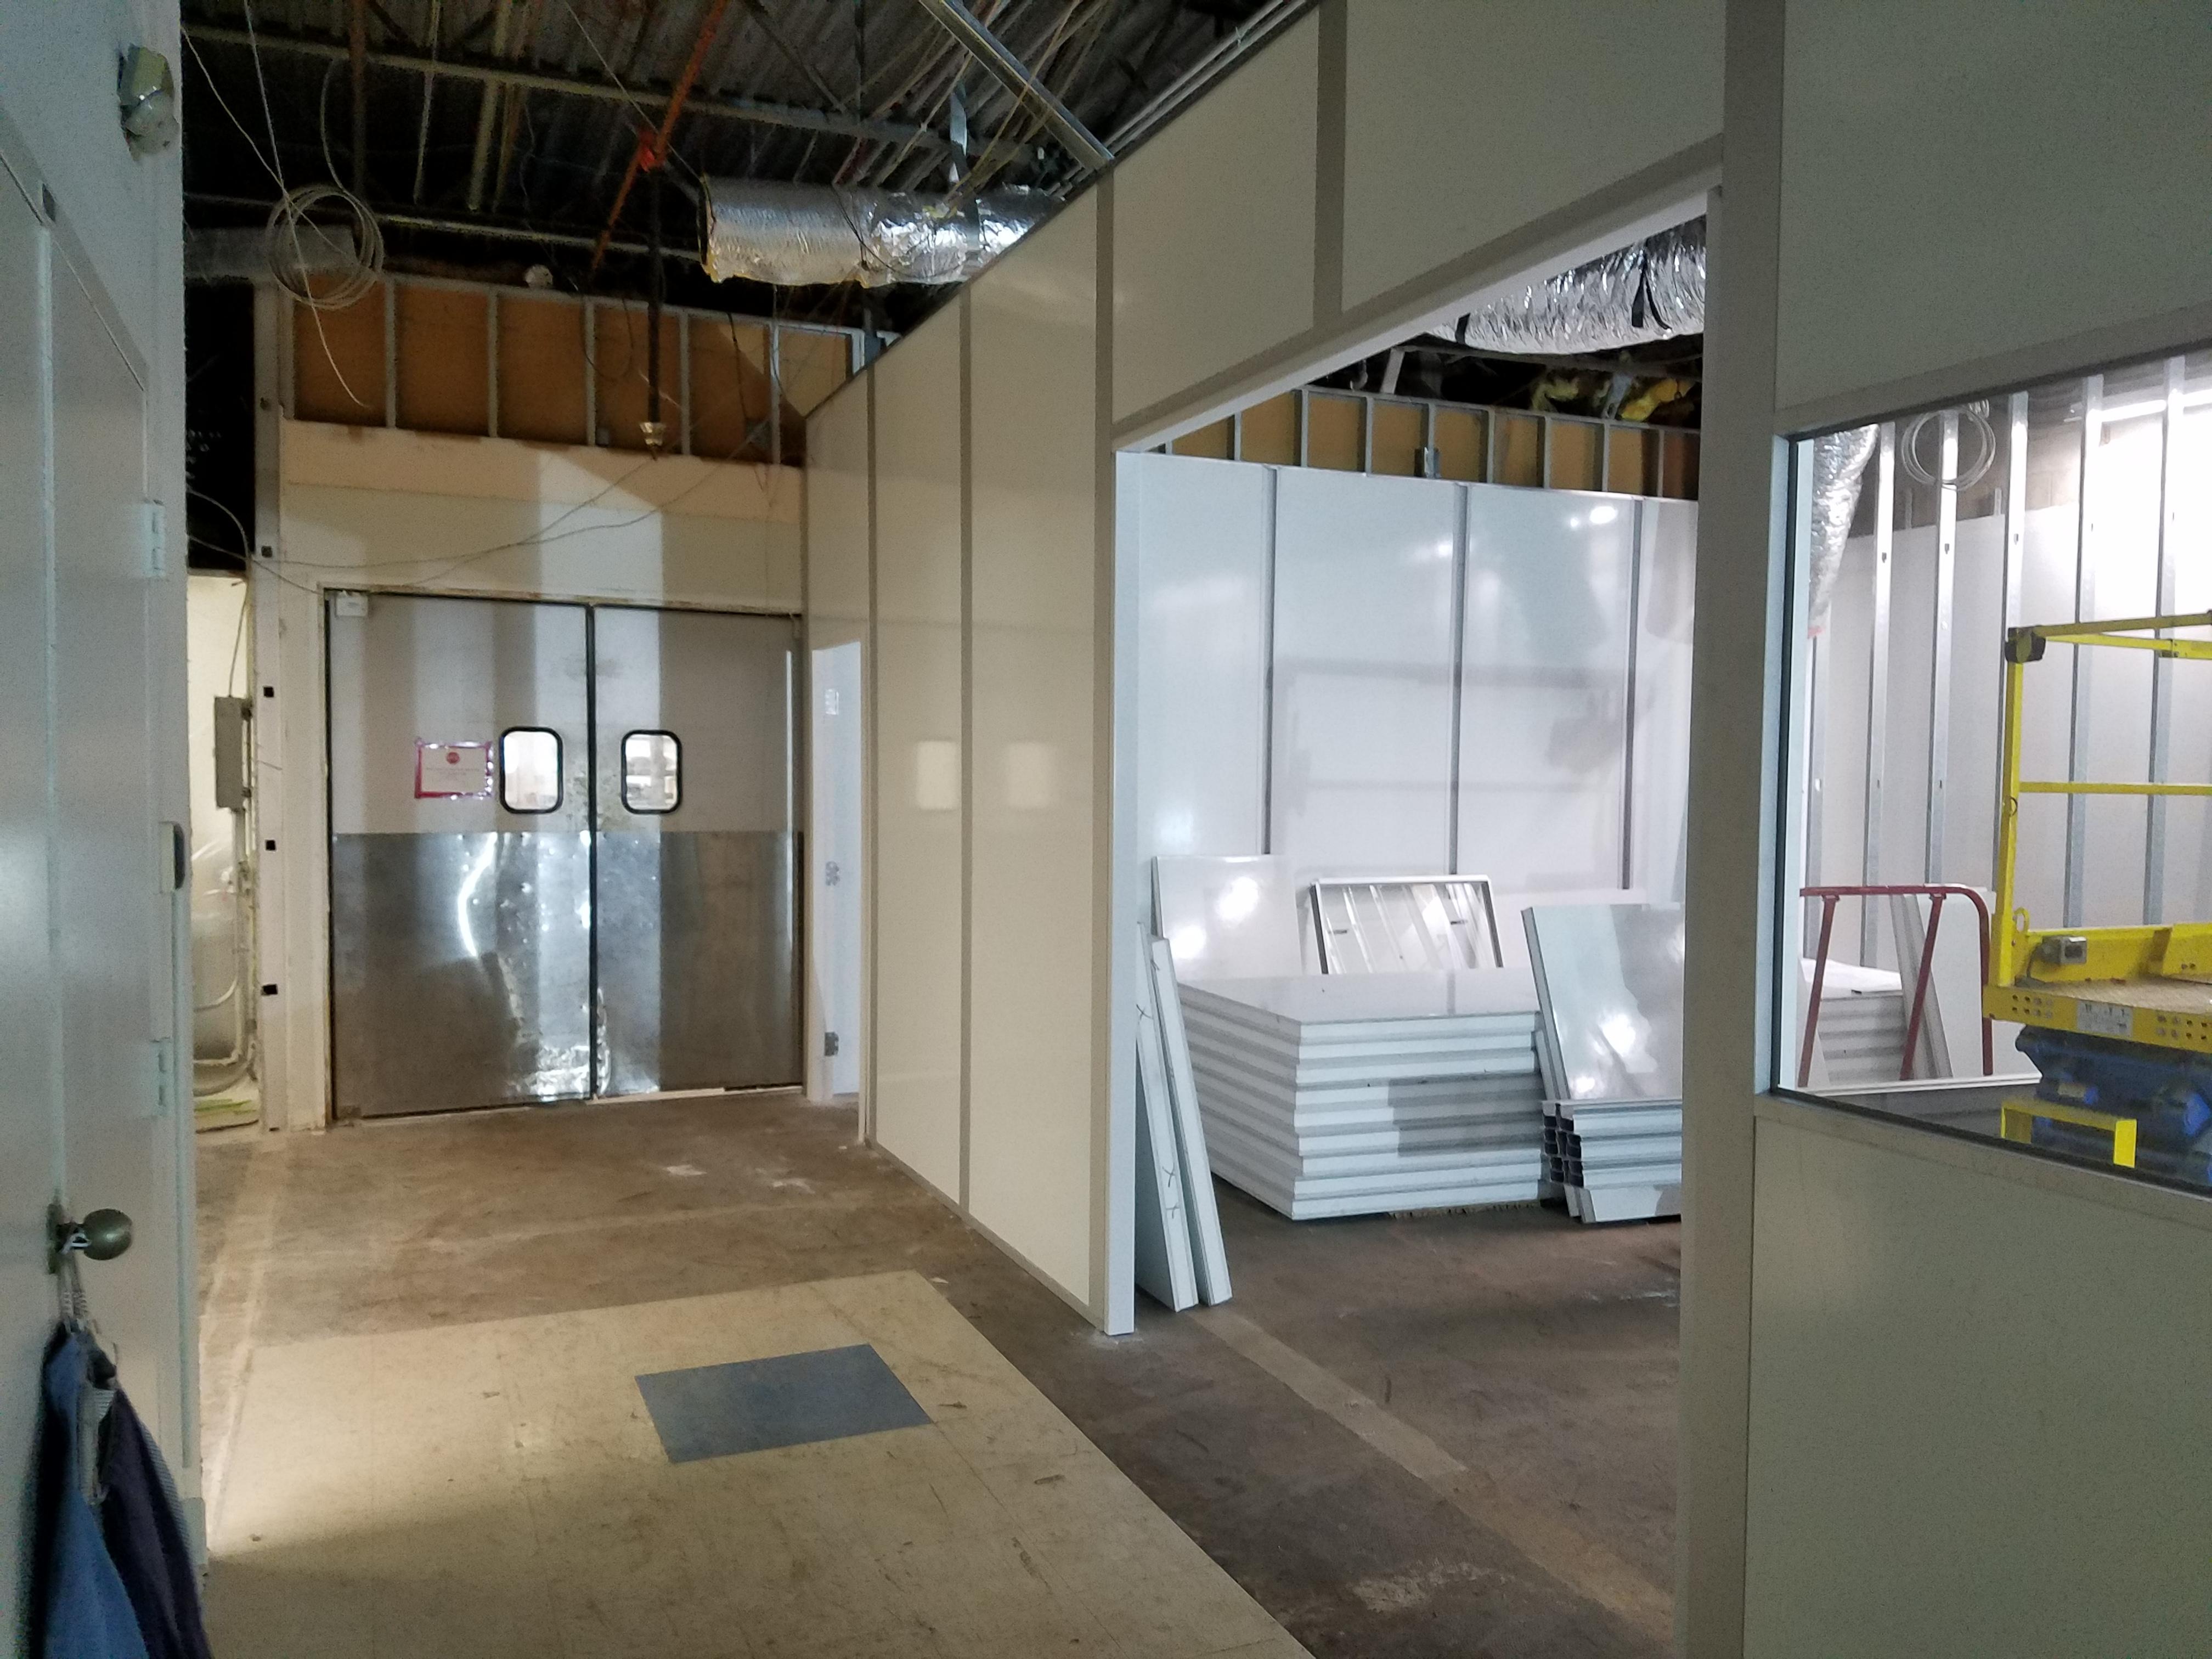 Cleanroom Modular Wall Panels